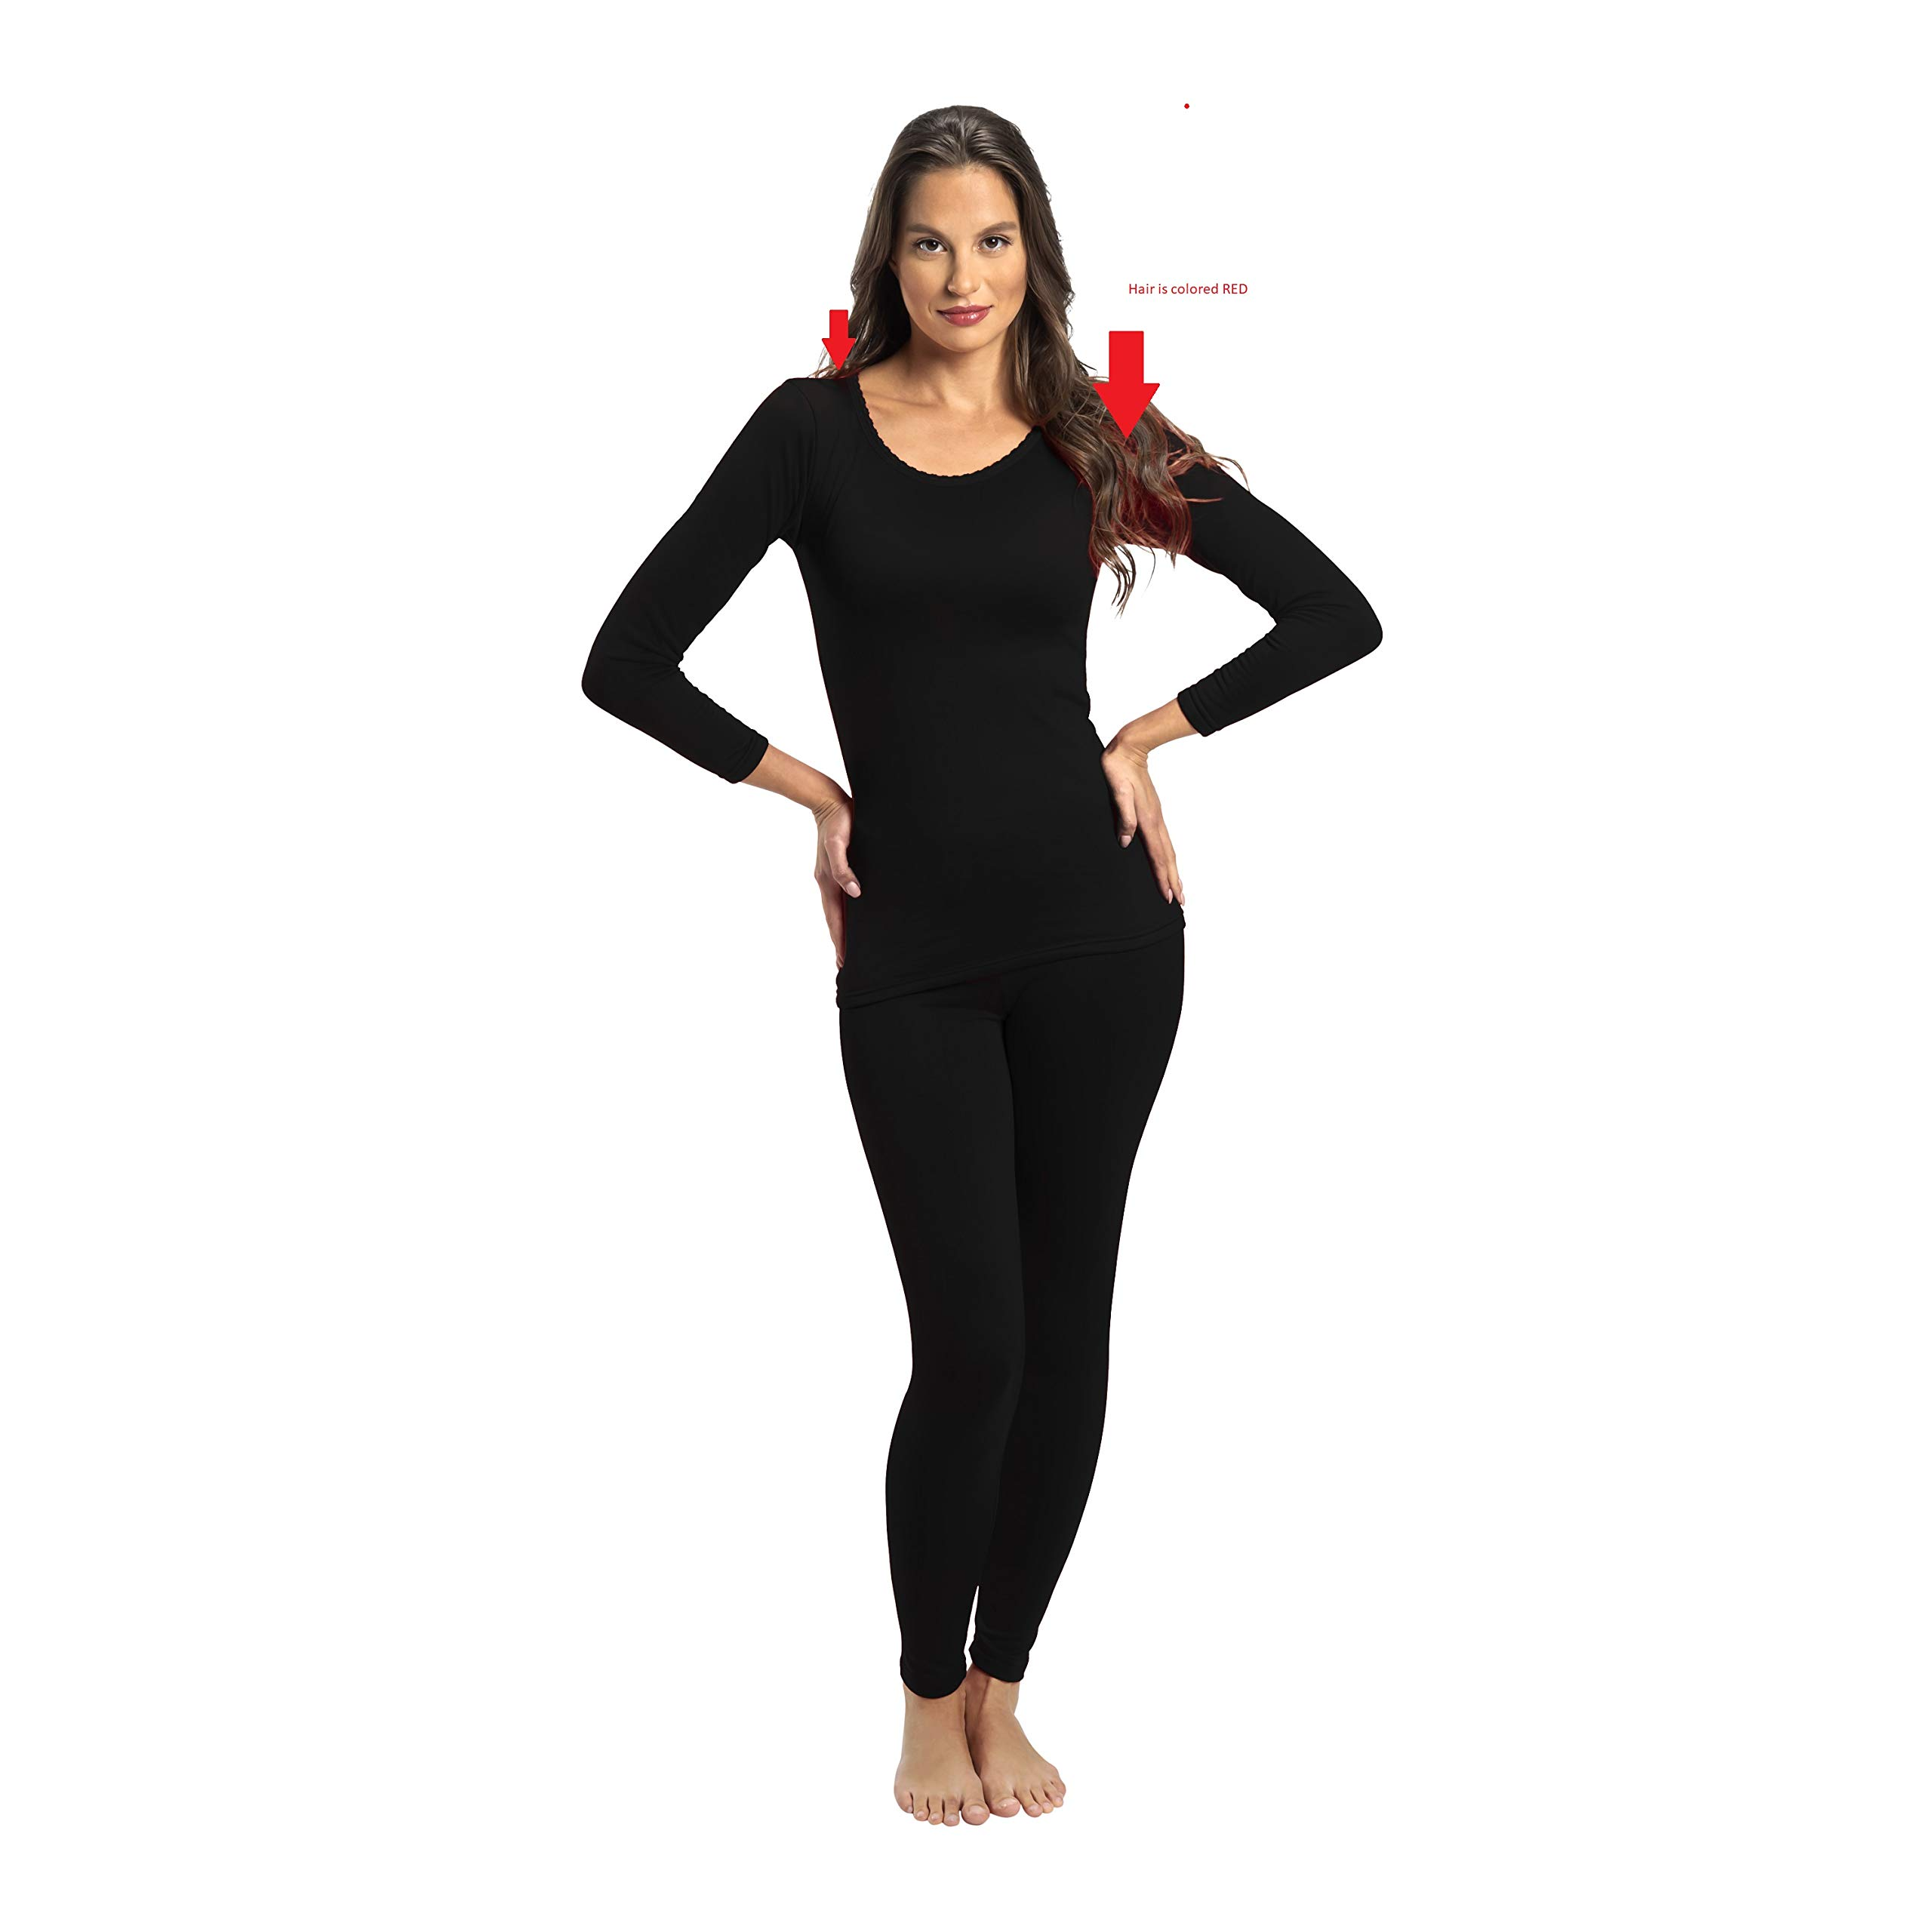 Rocky Thermal Underwear for Women Fleece Lined Thermals Women's Base Layer Long John Set Black by Rocky